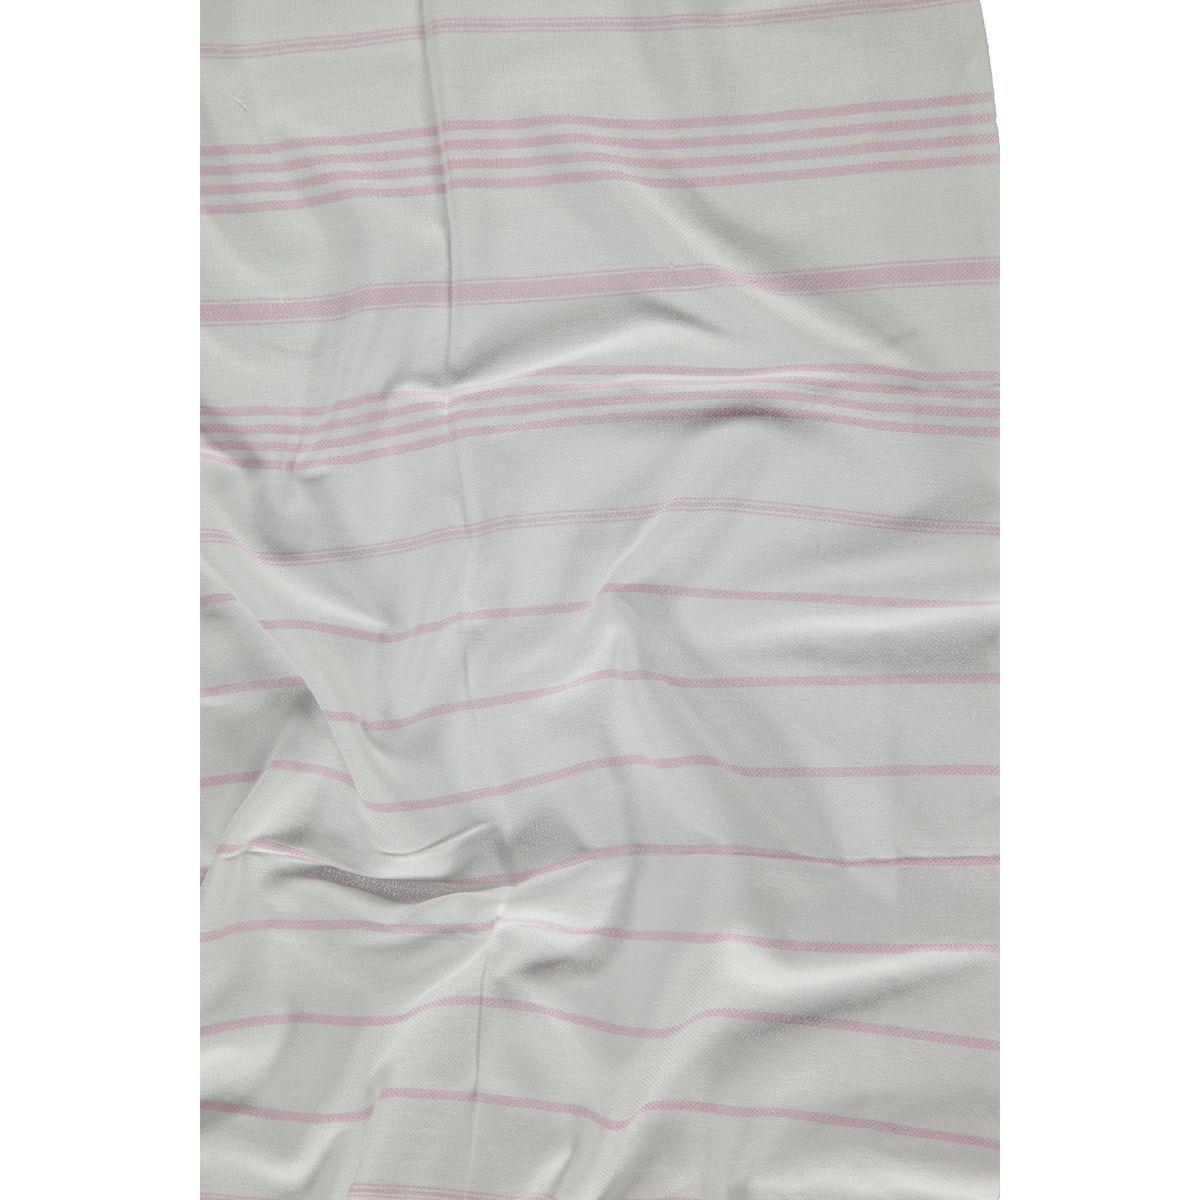 Peshkir Leyla / Pink Stripes